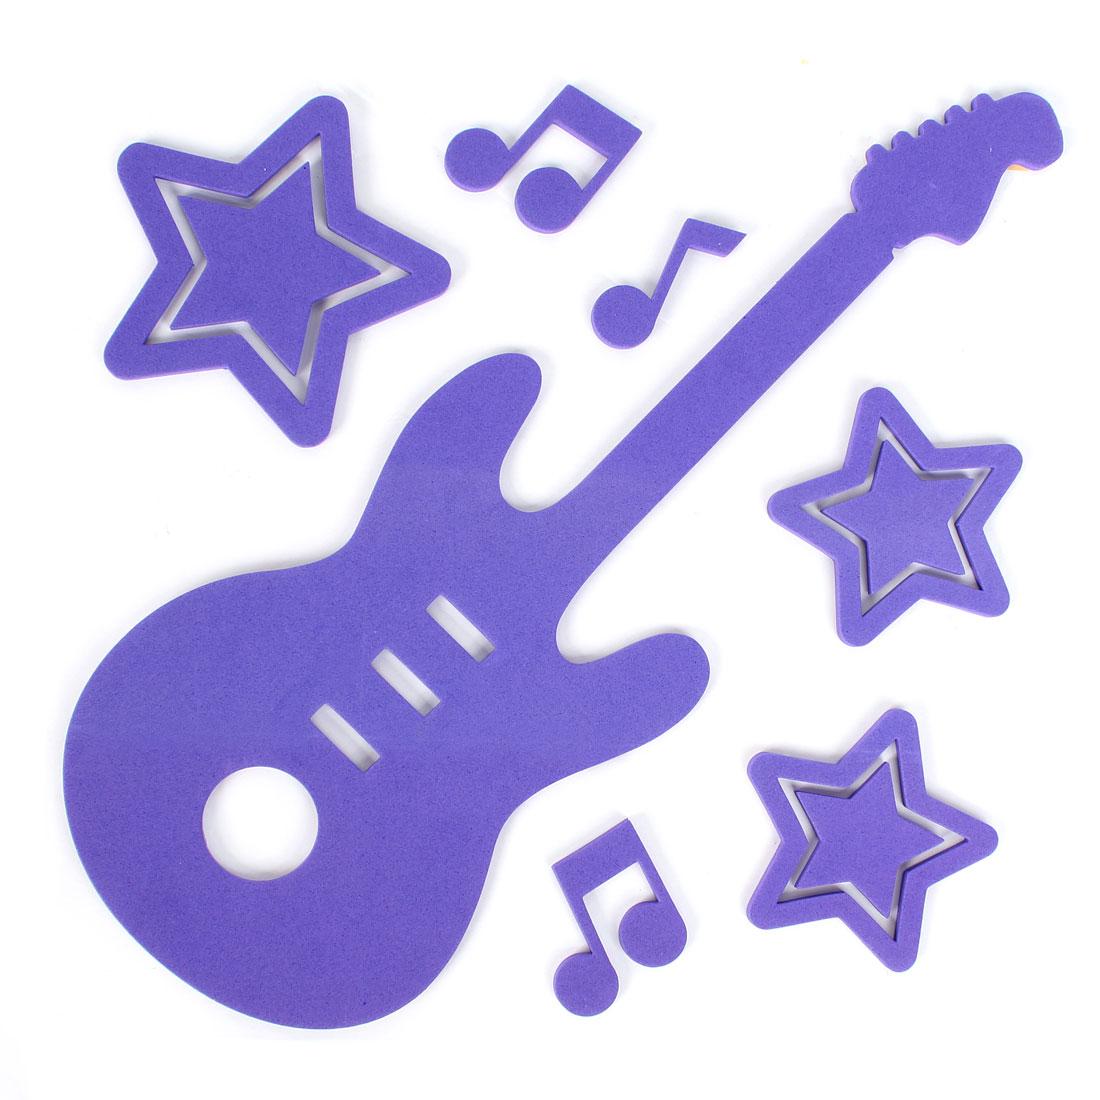 Home Bathroom Decor 3D Guitar Shape Foam Wall Sticker Decal DIY Purple